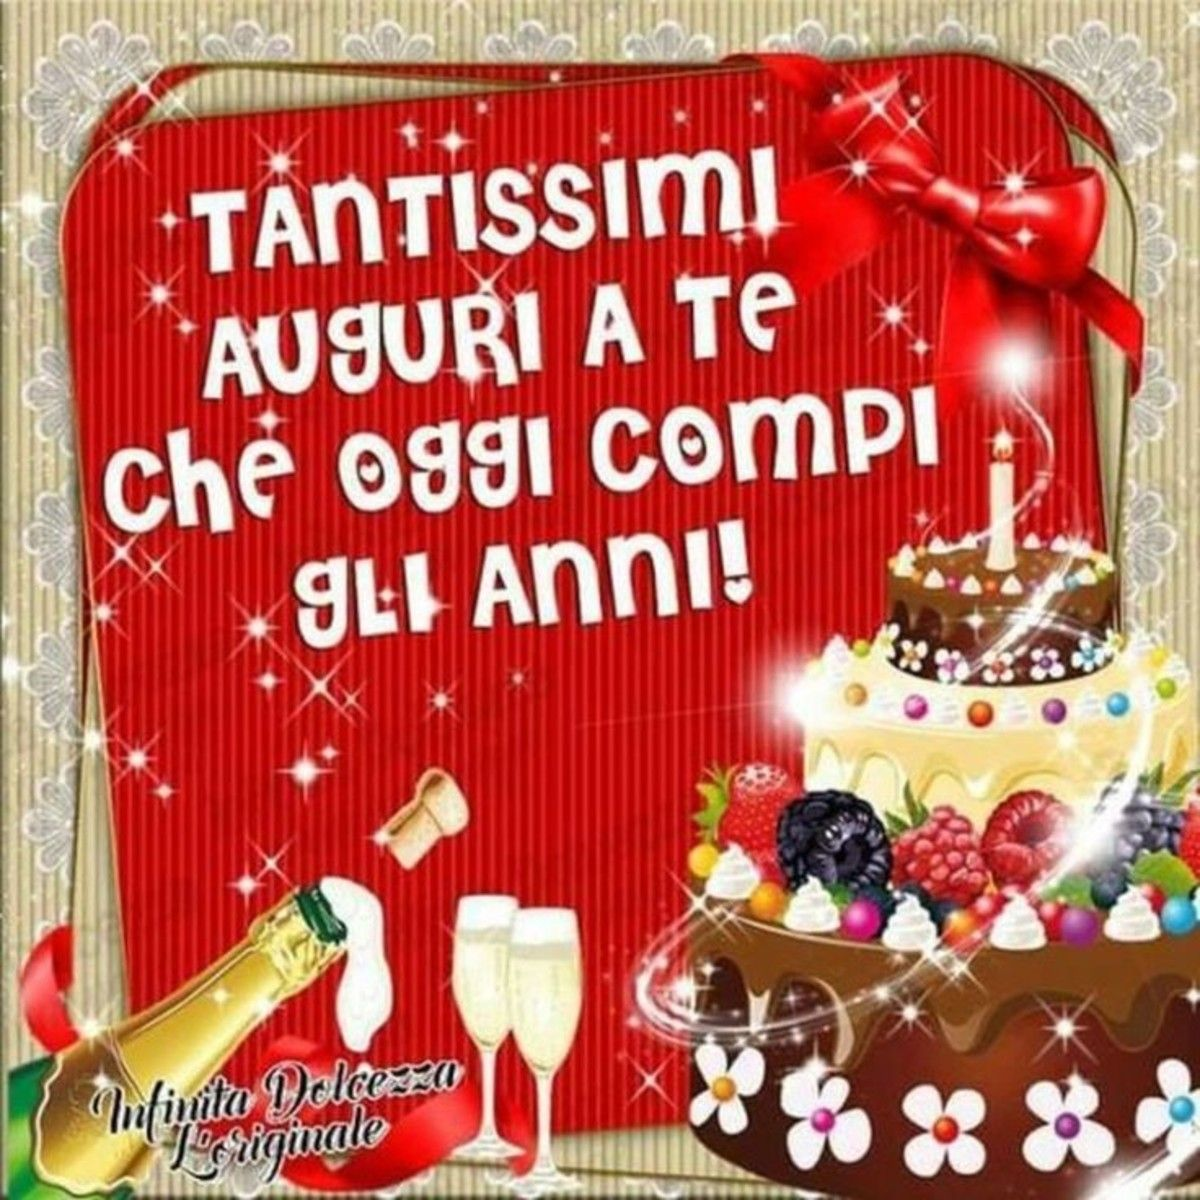 Tantissimi Auguri A Te 2 Buongiornoate It Auguri Di Buon Compleanno Buon Compleanno Compleanno